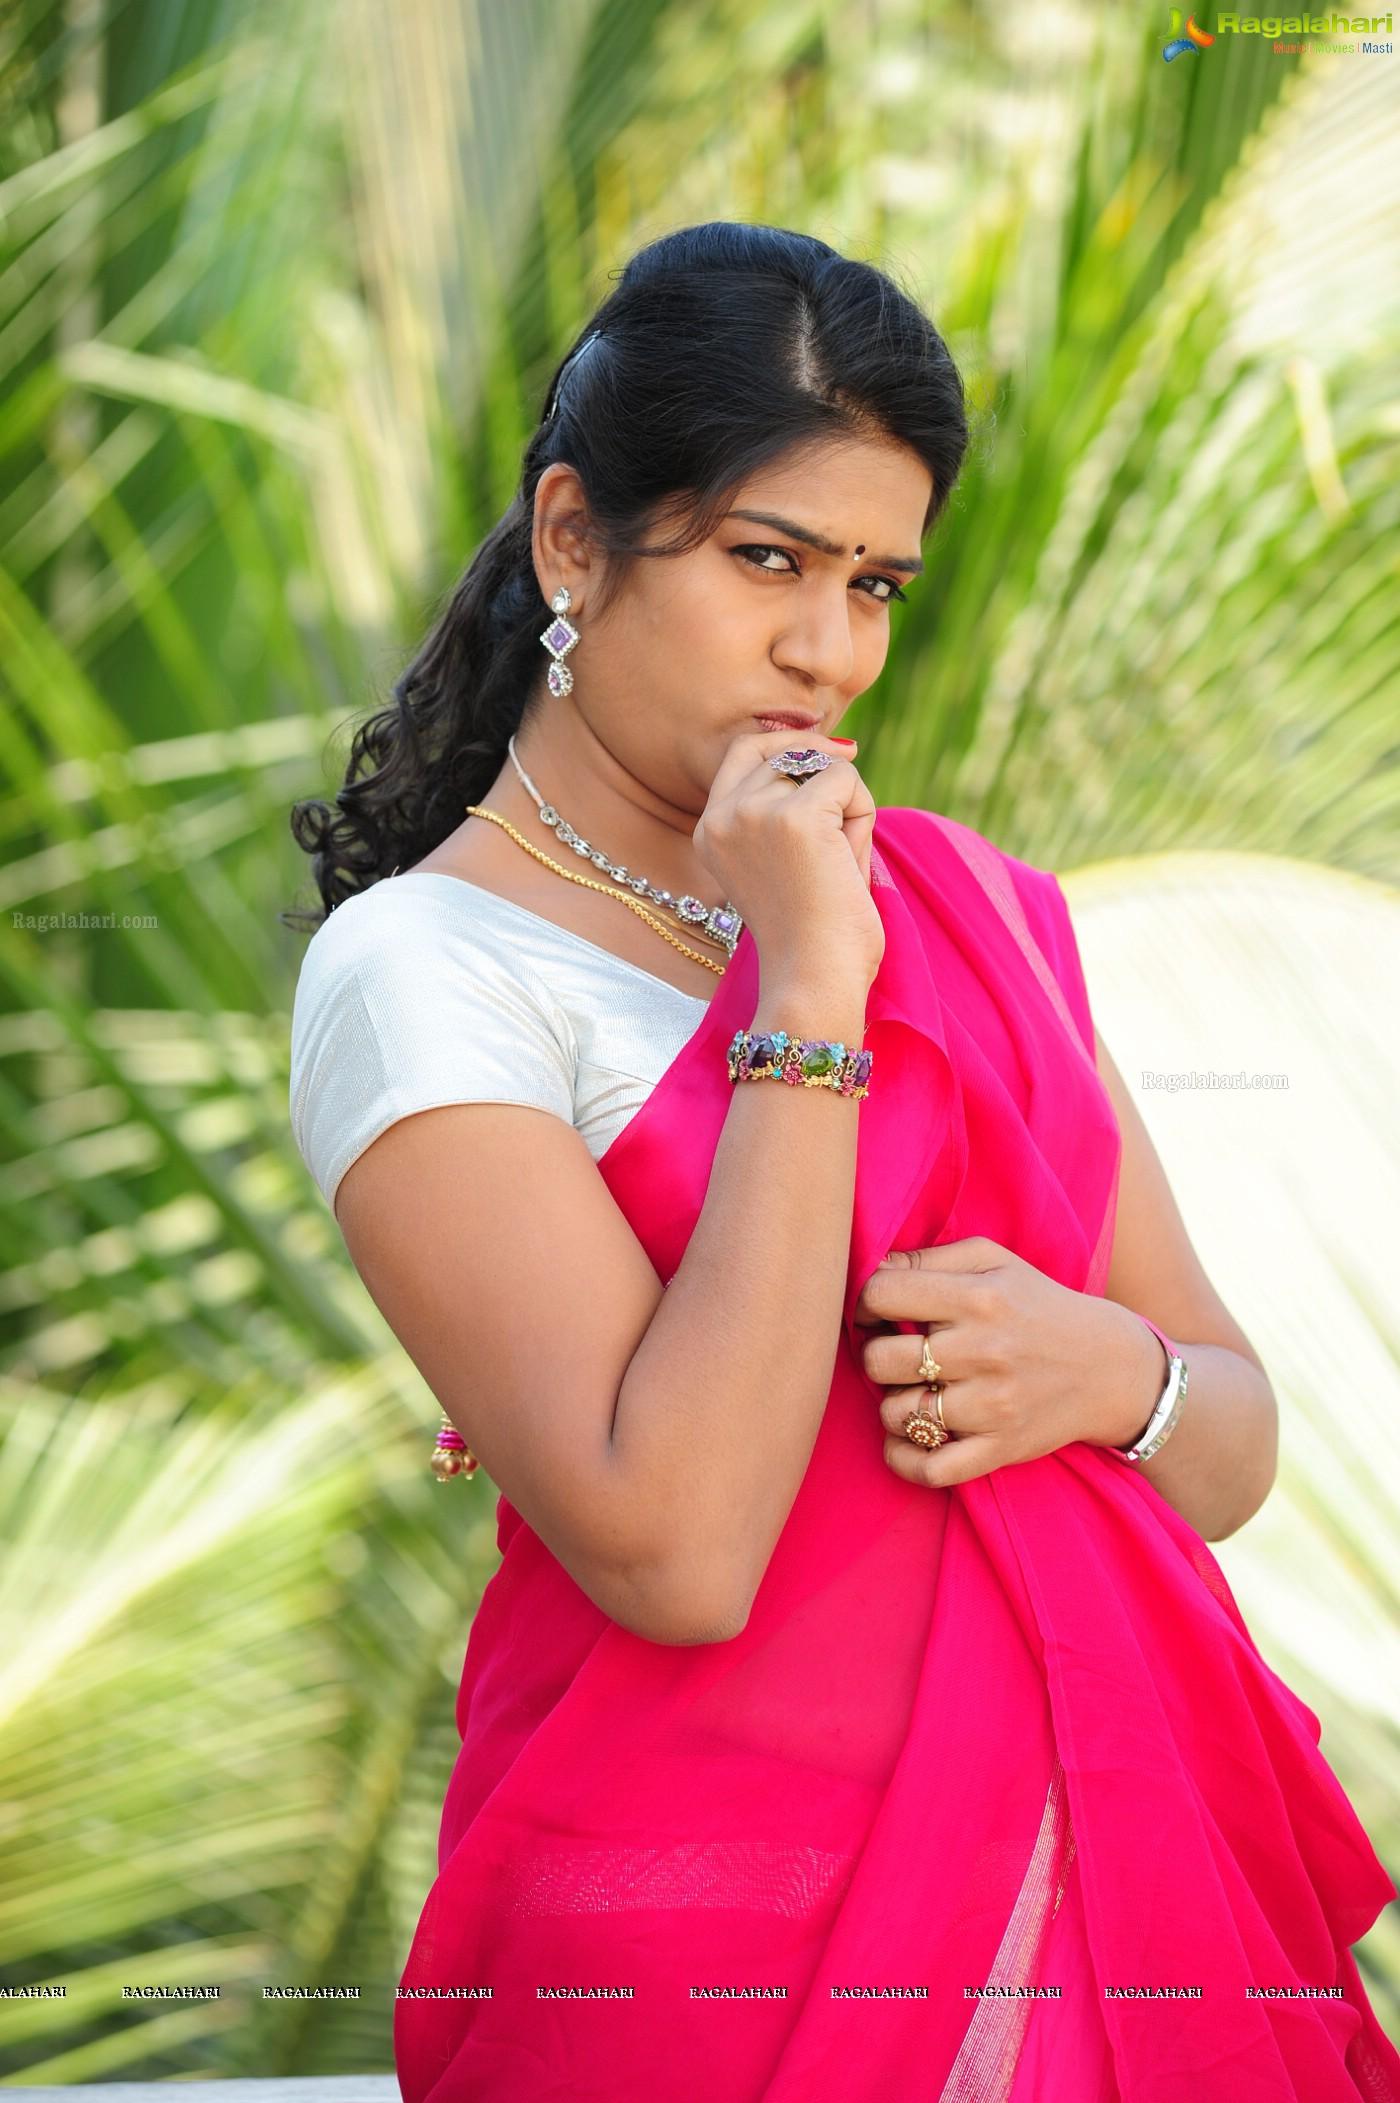 Bhavana posters image 25 telugu actress photosimages photos bhavana posters altavistaventures Gallery